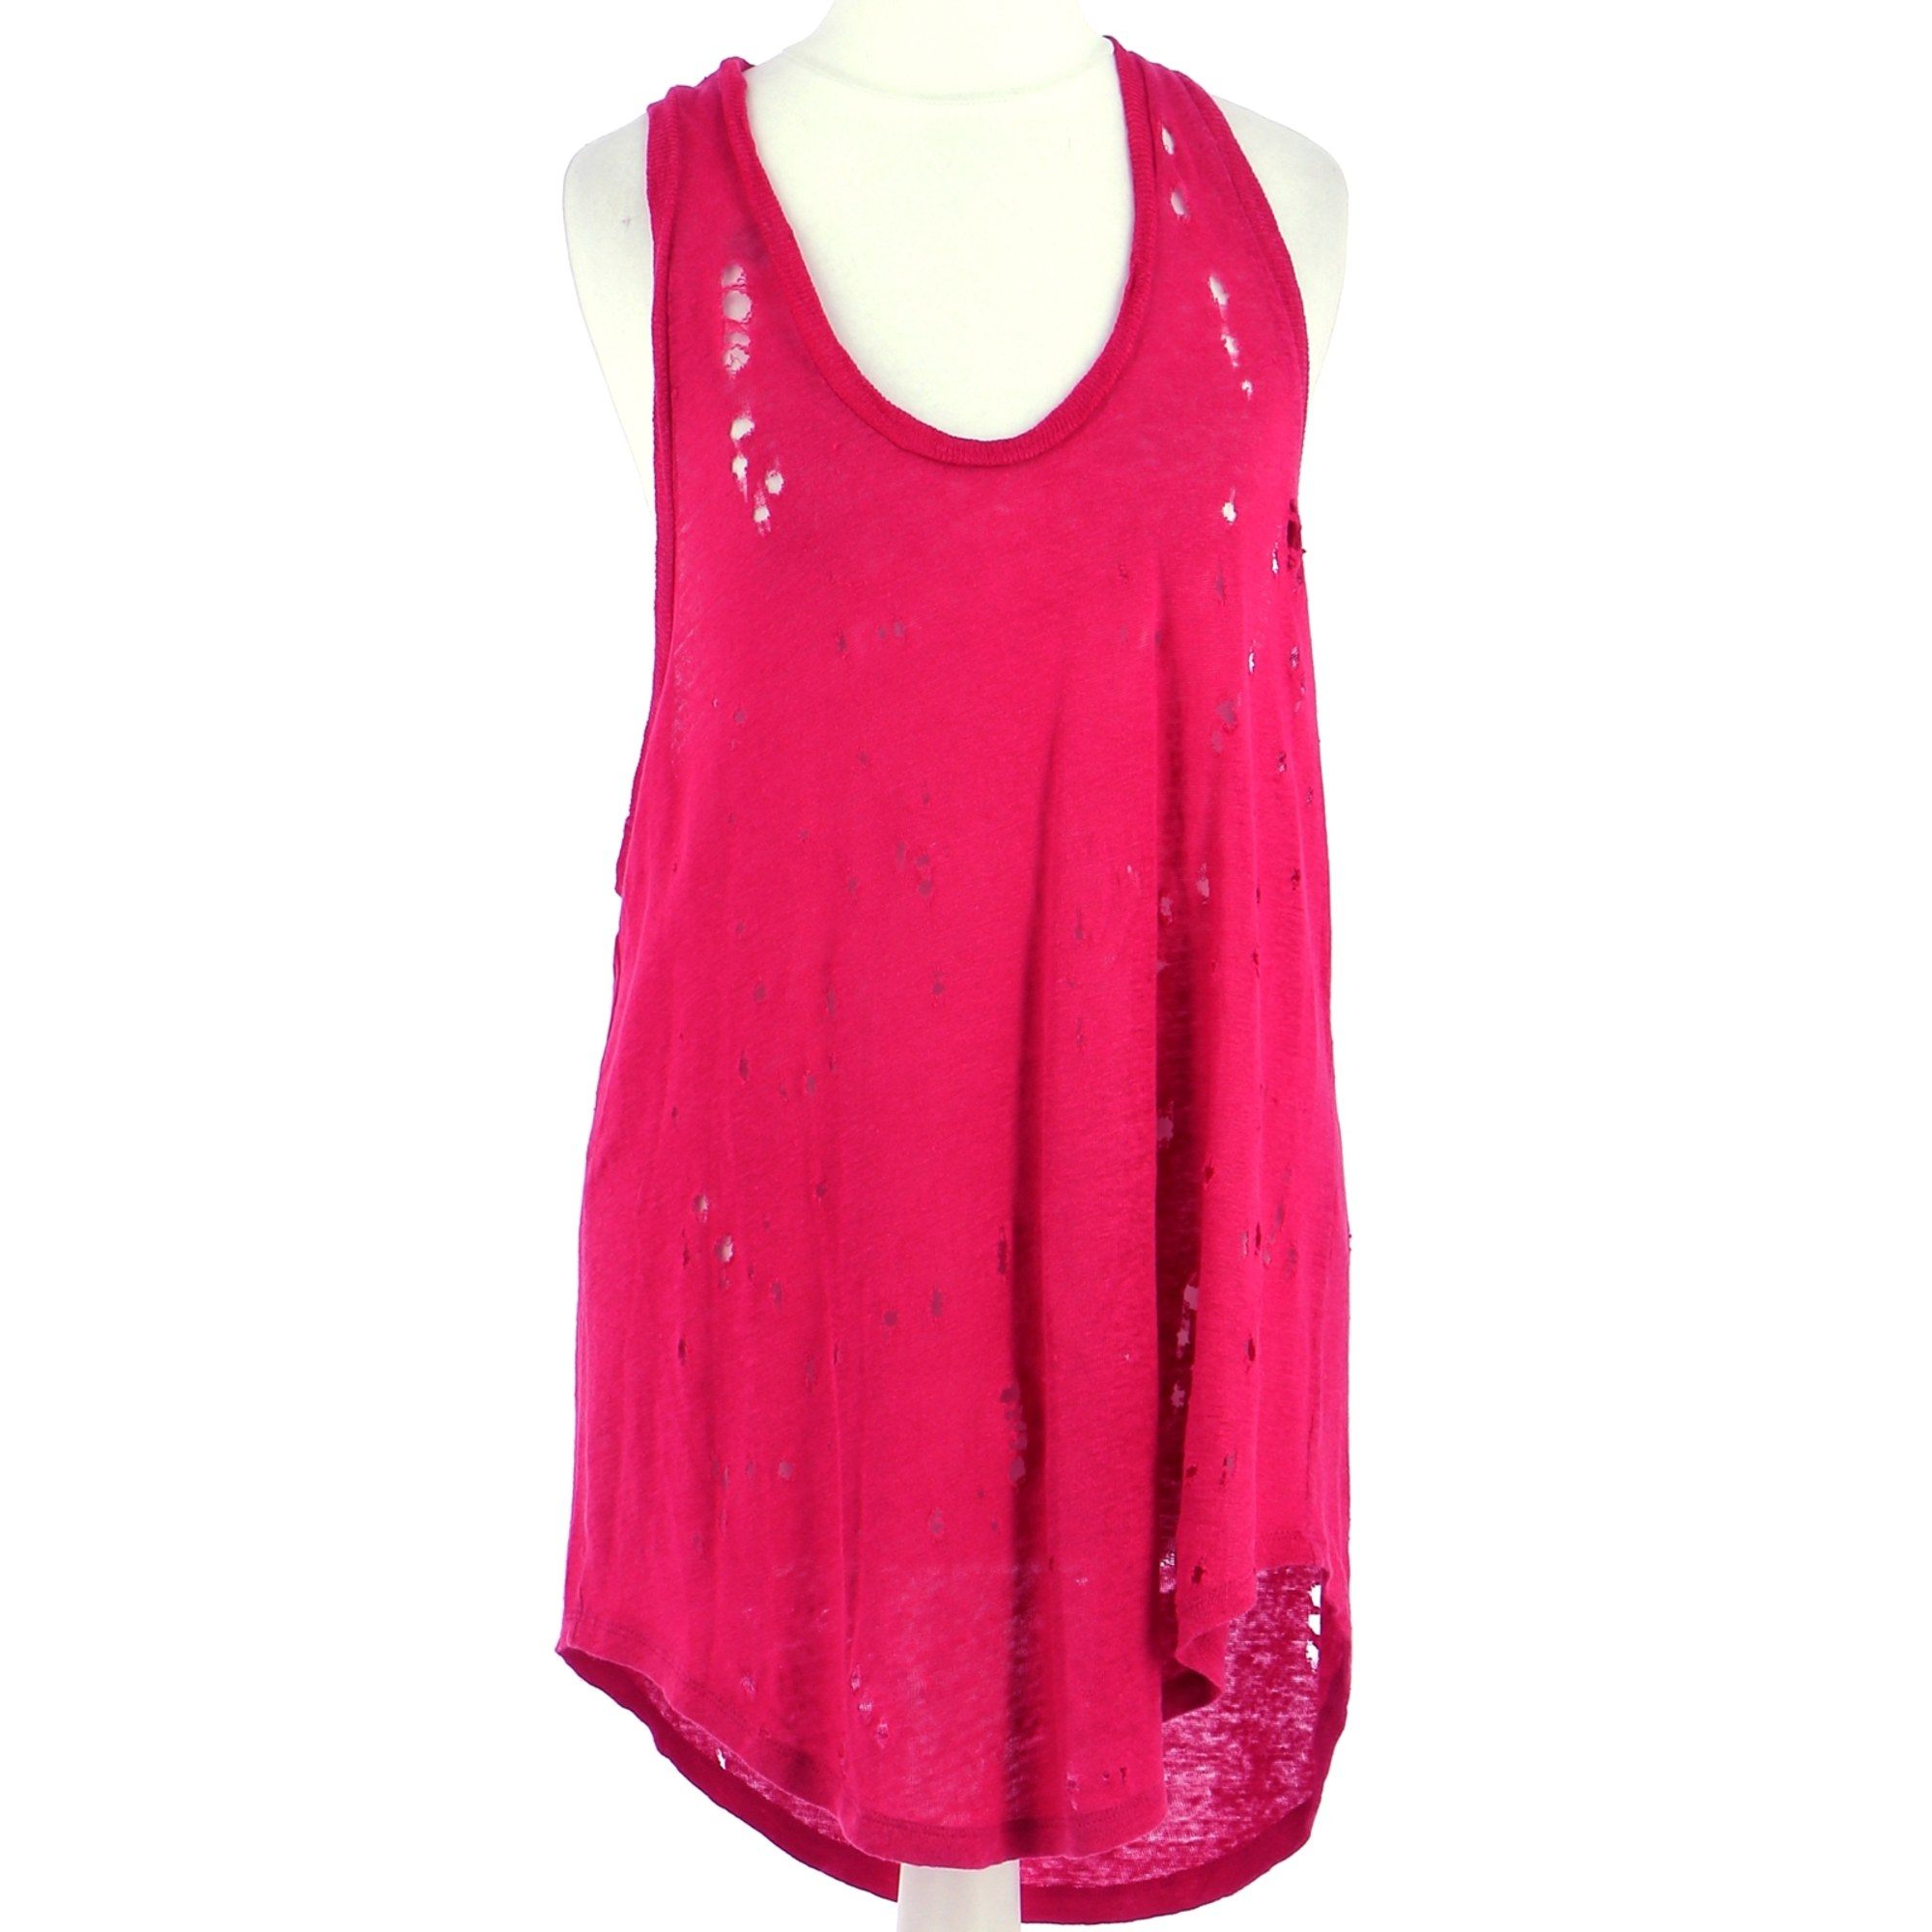 Top, T-shirt IRO Pink, fuchsia, light pink